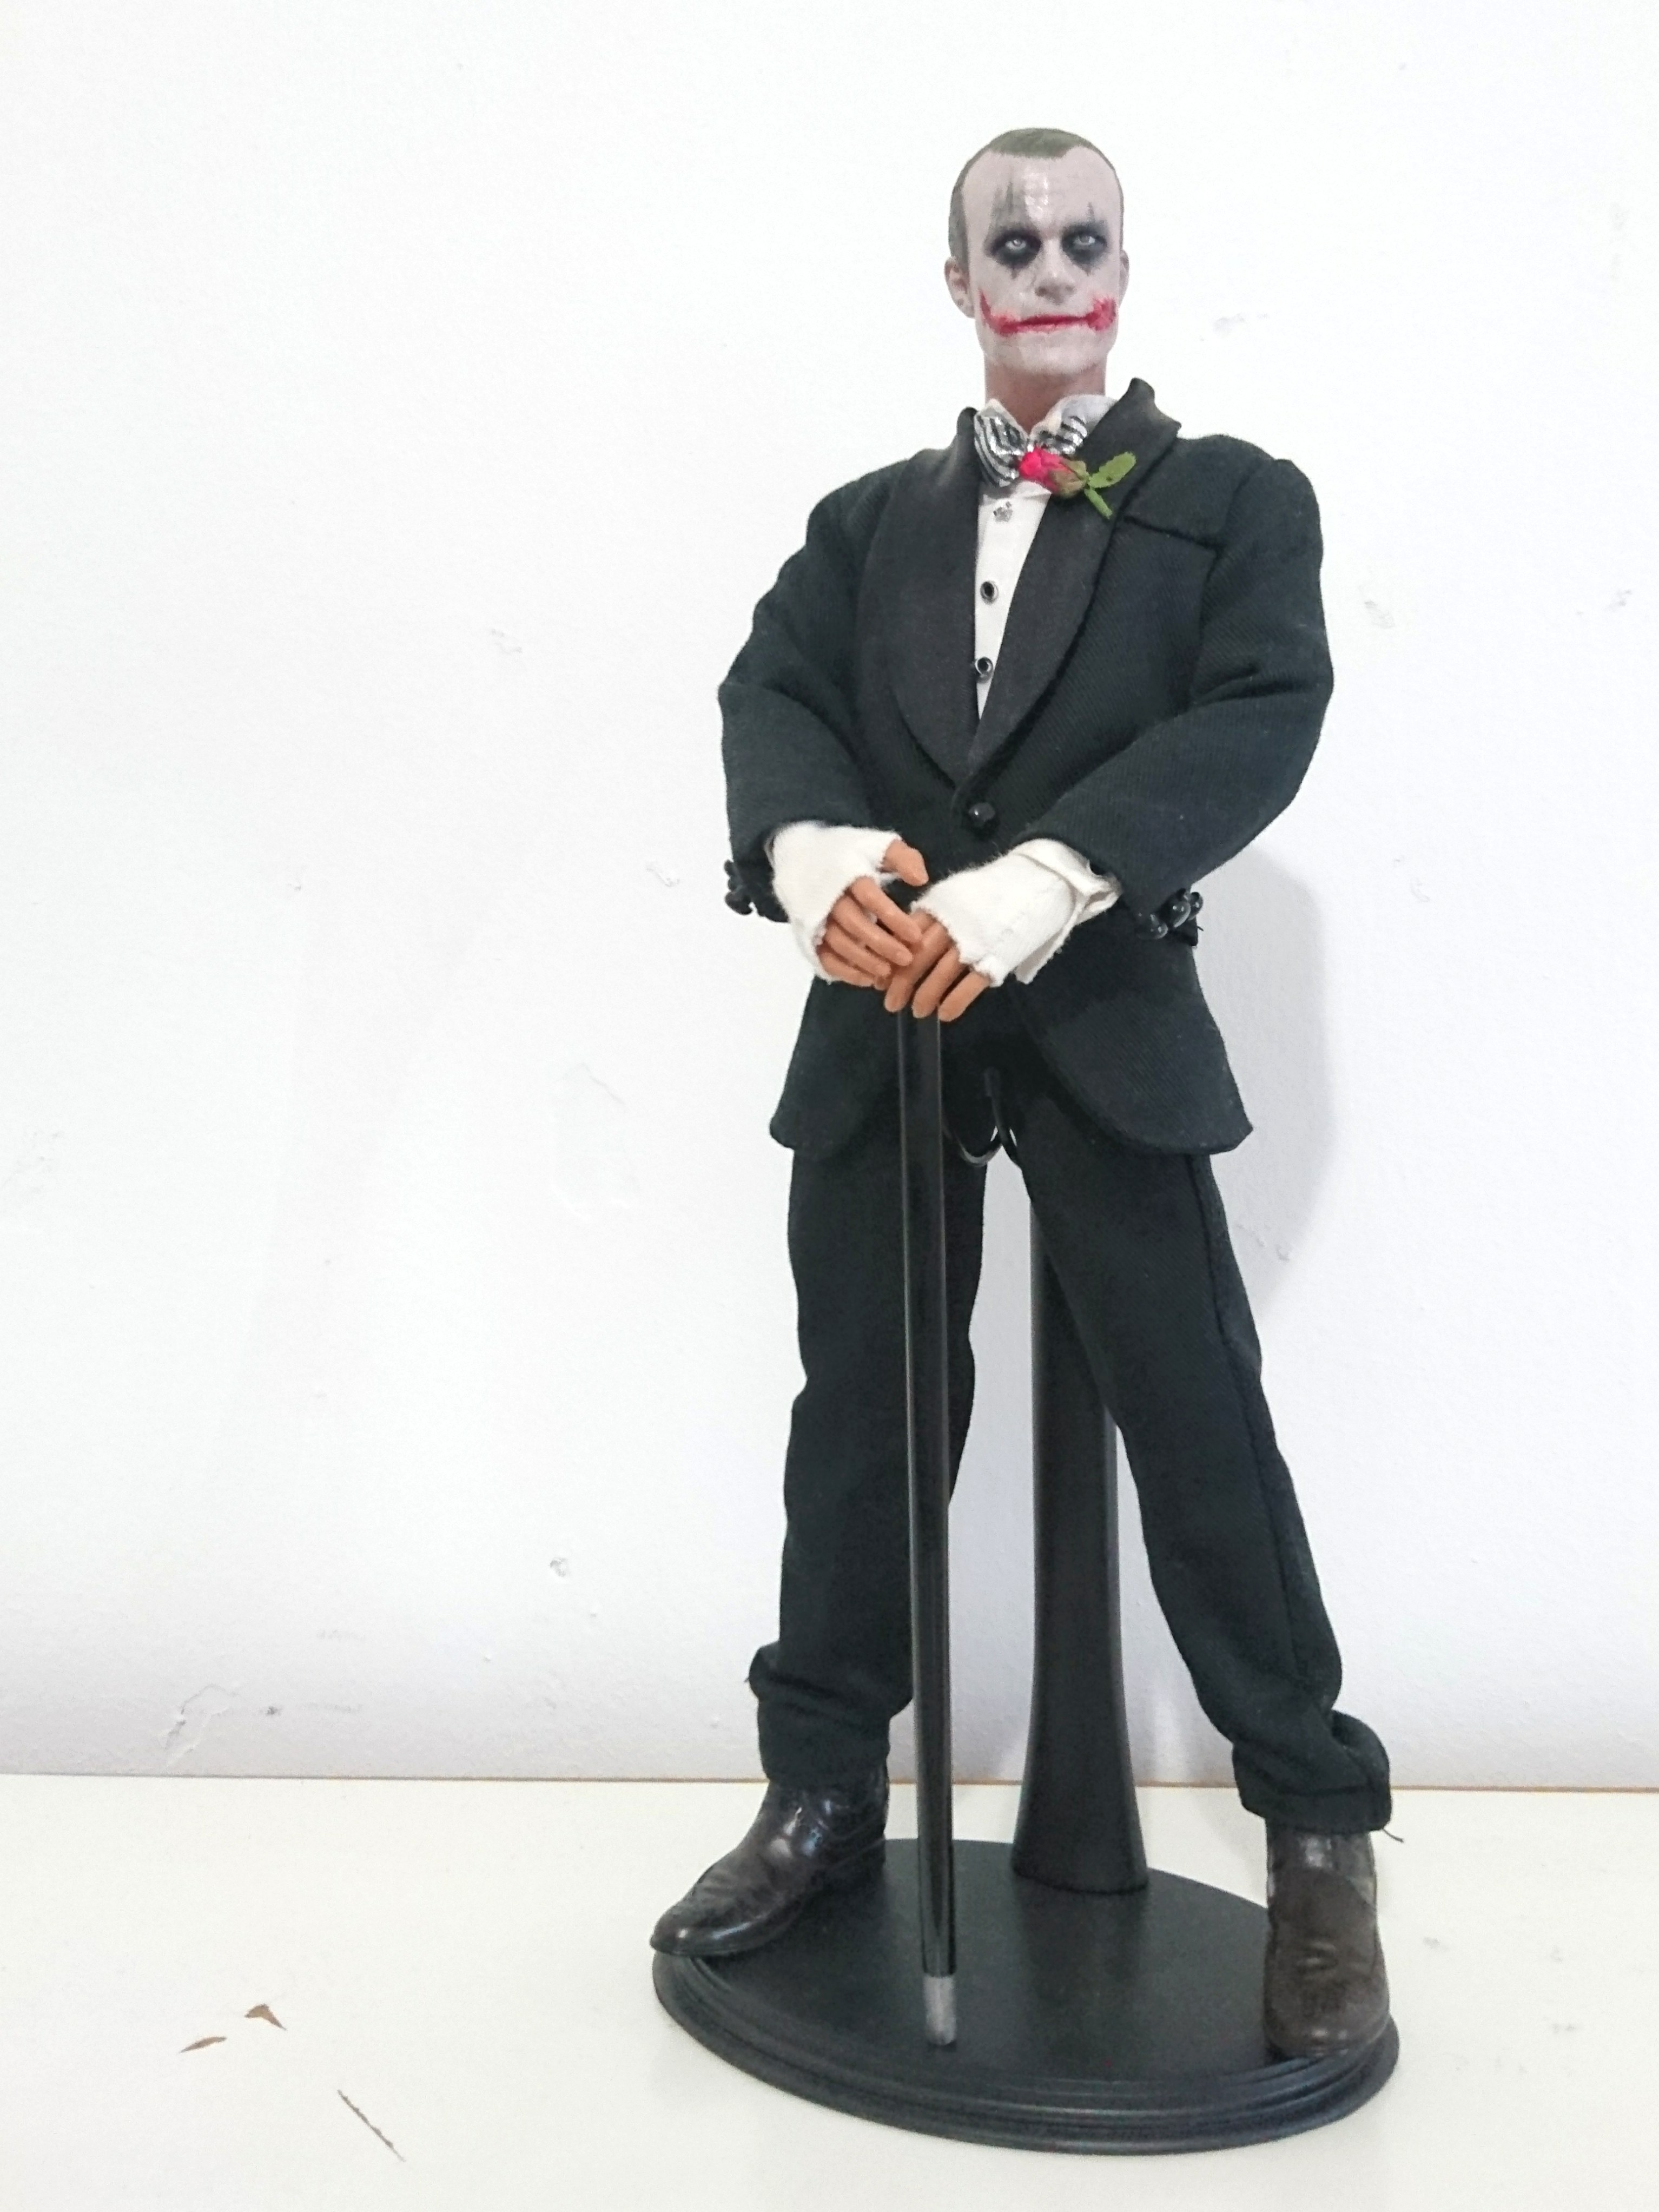 1 6 scale joker in gangster tuxedo toys games bricks figurines